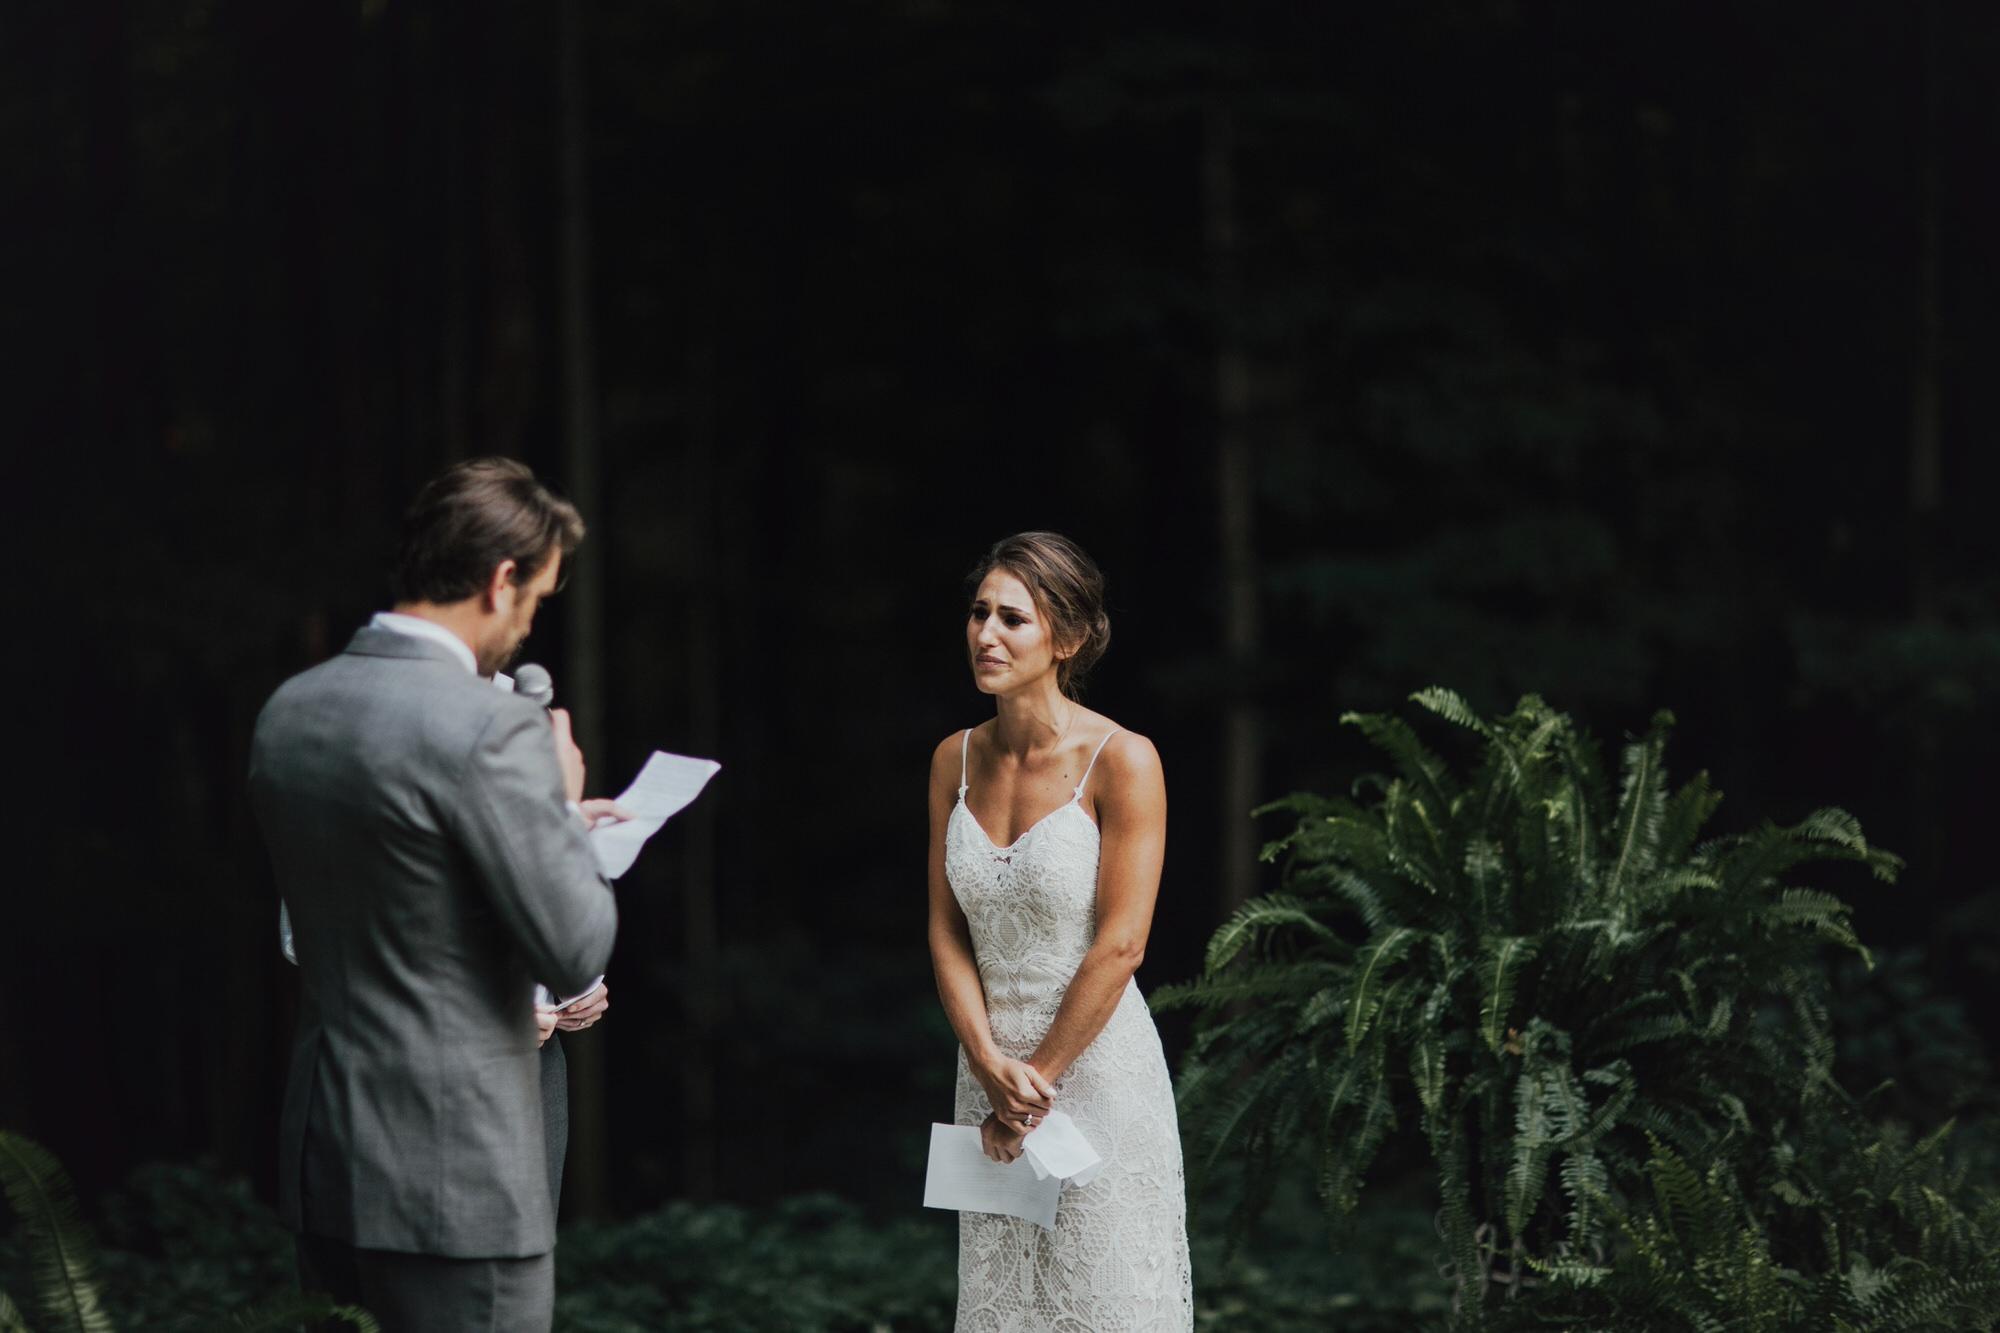 emily-aaron-rochester-new-york-wedding-photographer-165.JPG